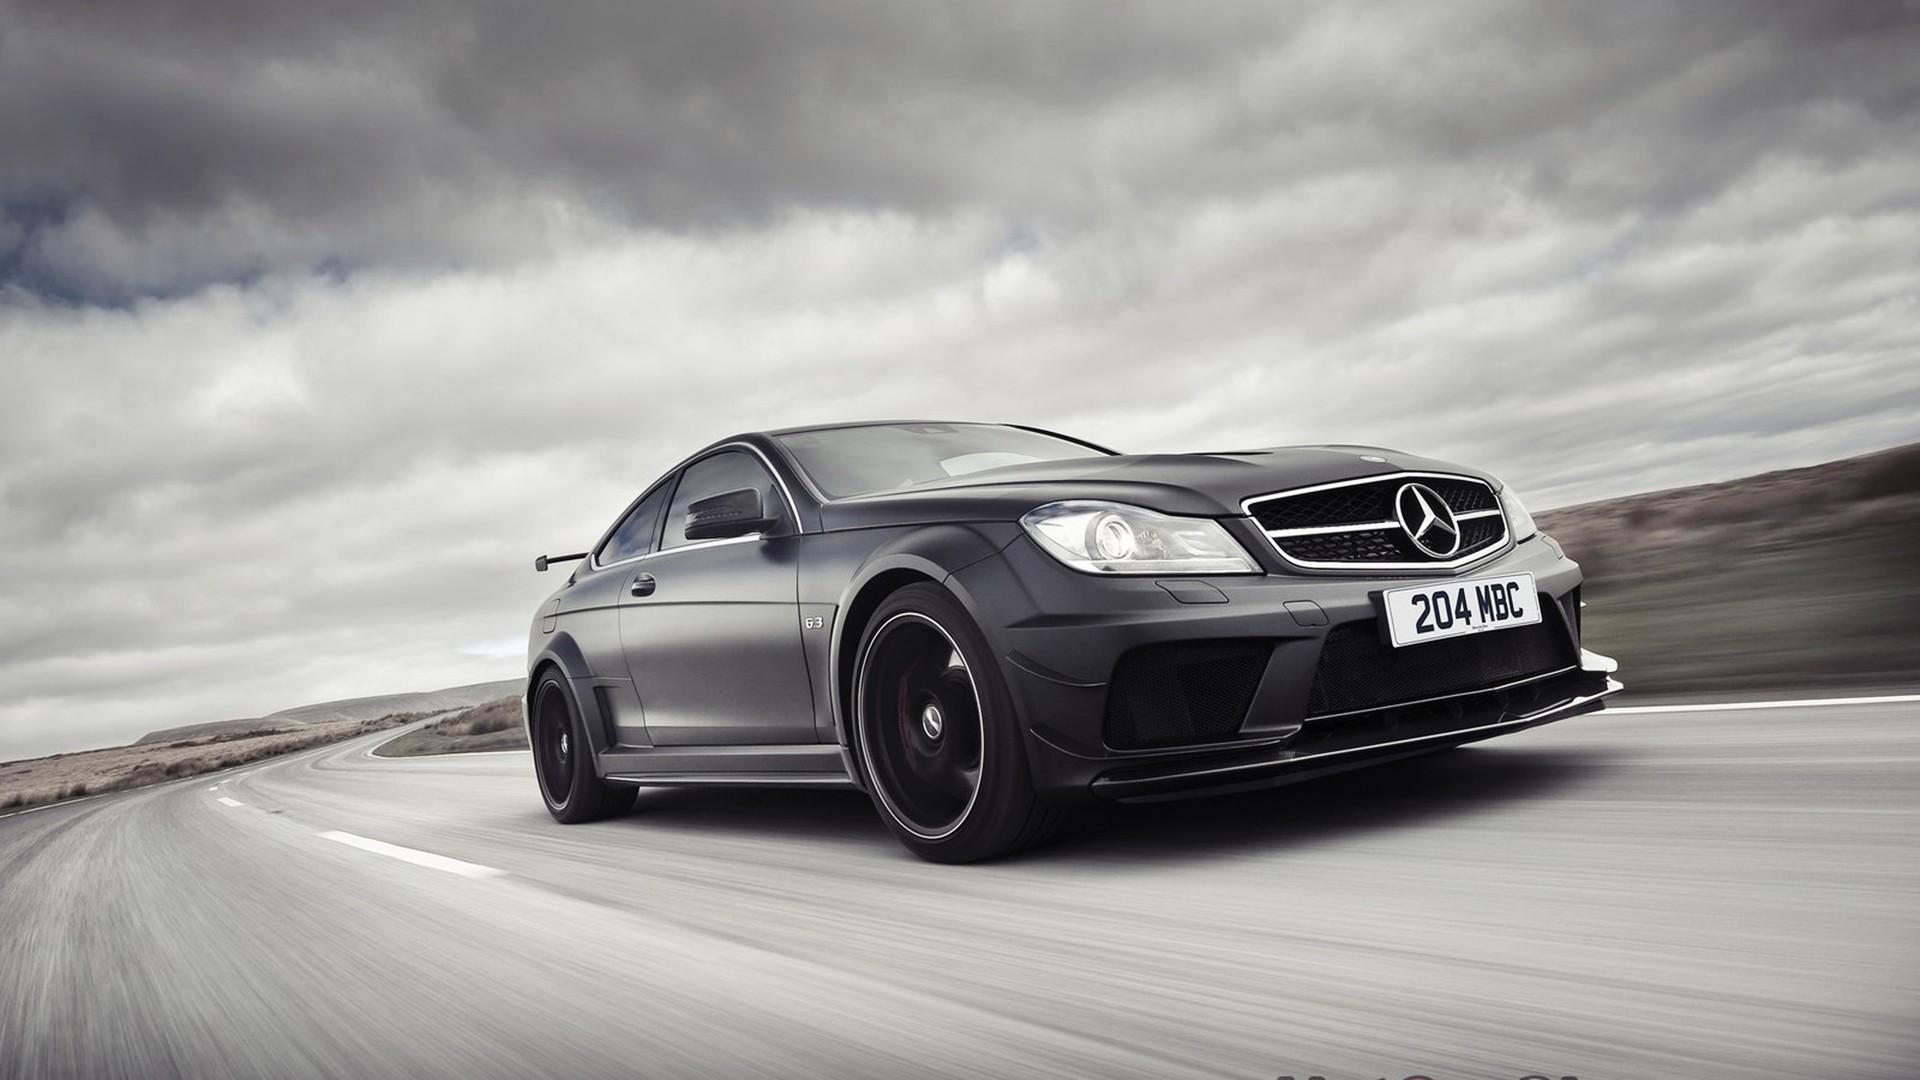 Black Cars Roads Automotive Royal Respect Mercedes Benz